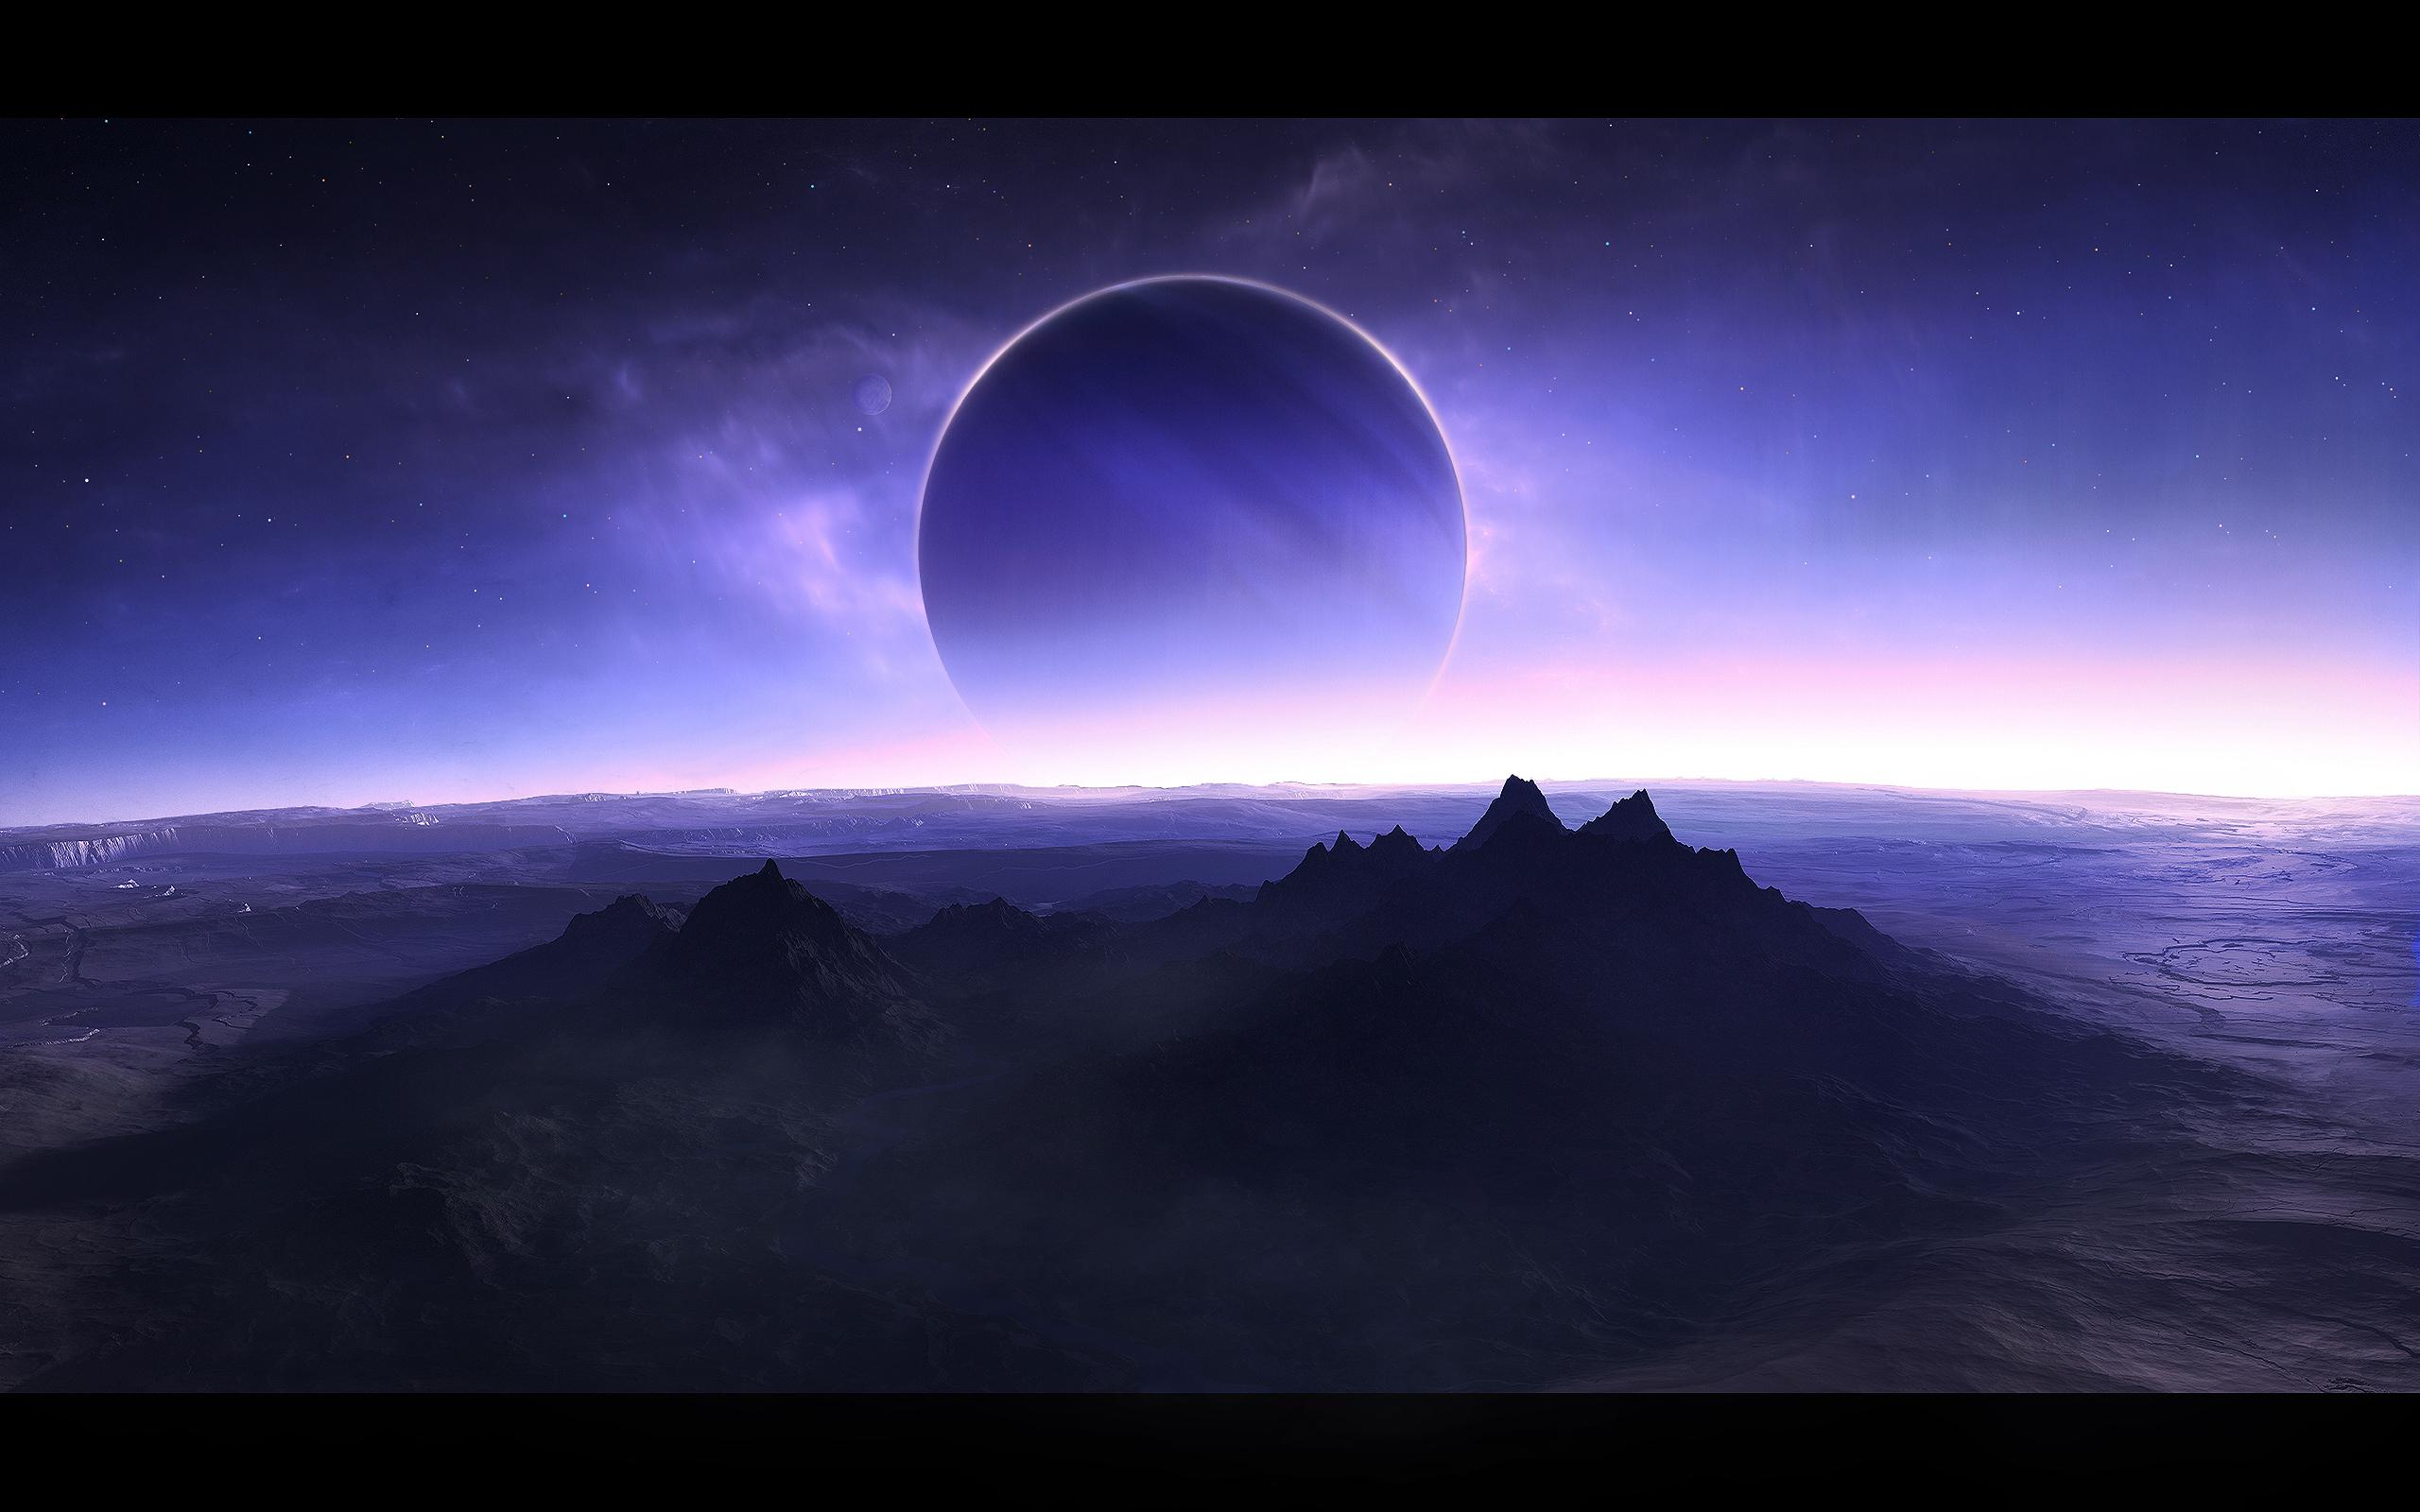 HD Wallpapers Sci Fi Twilight